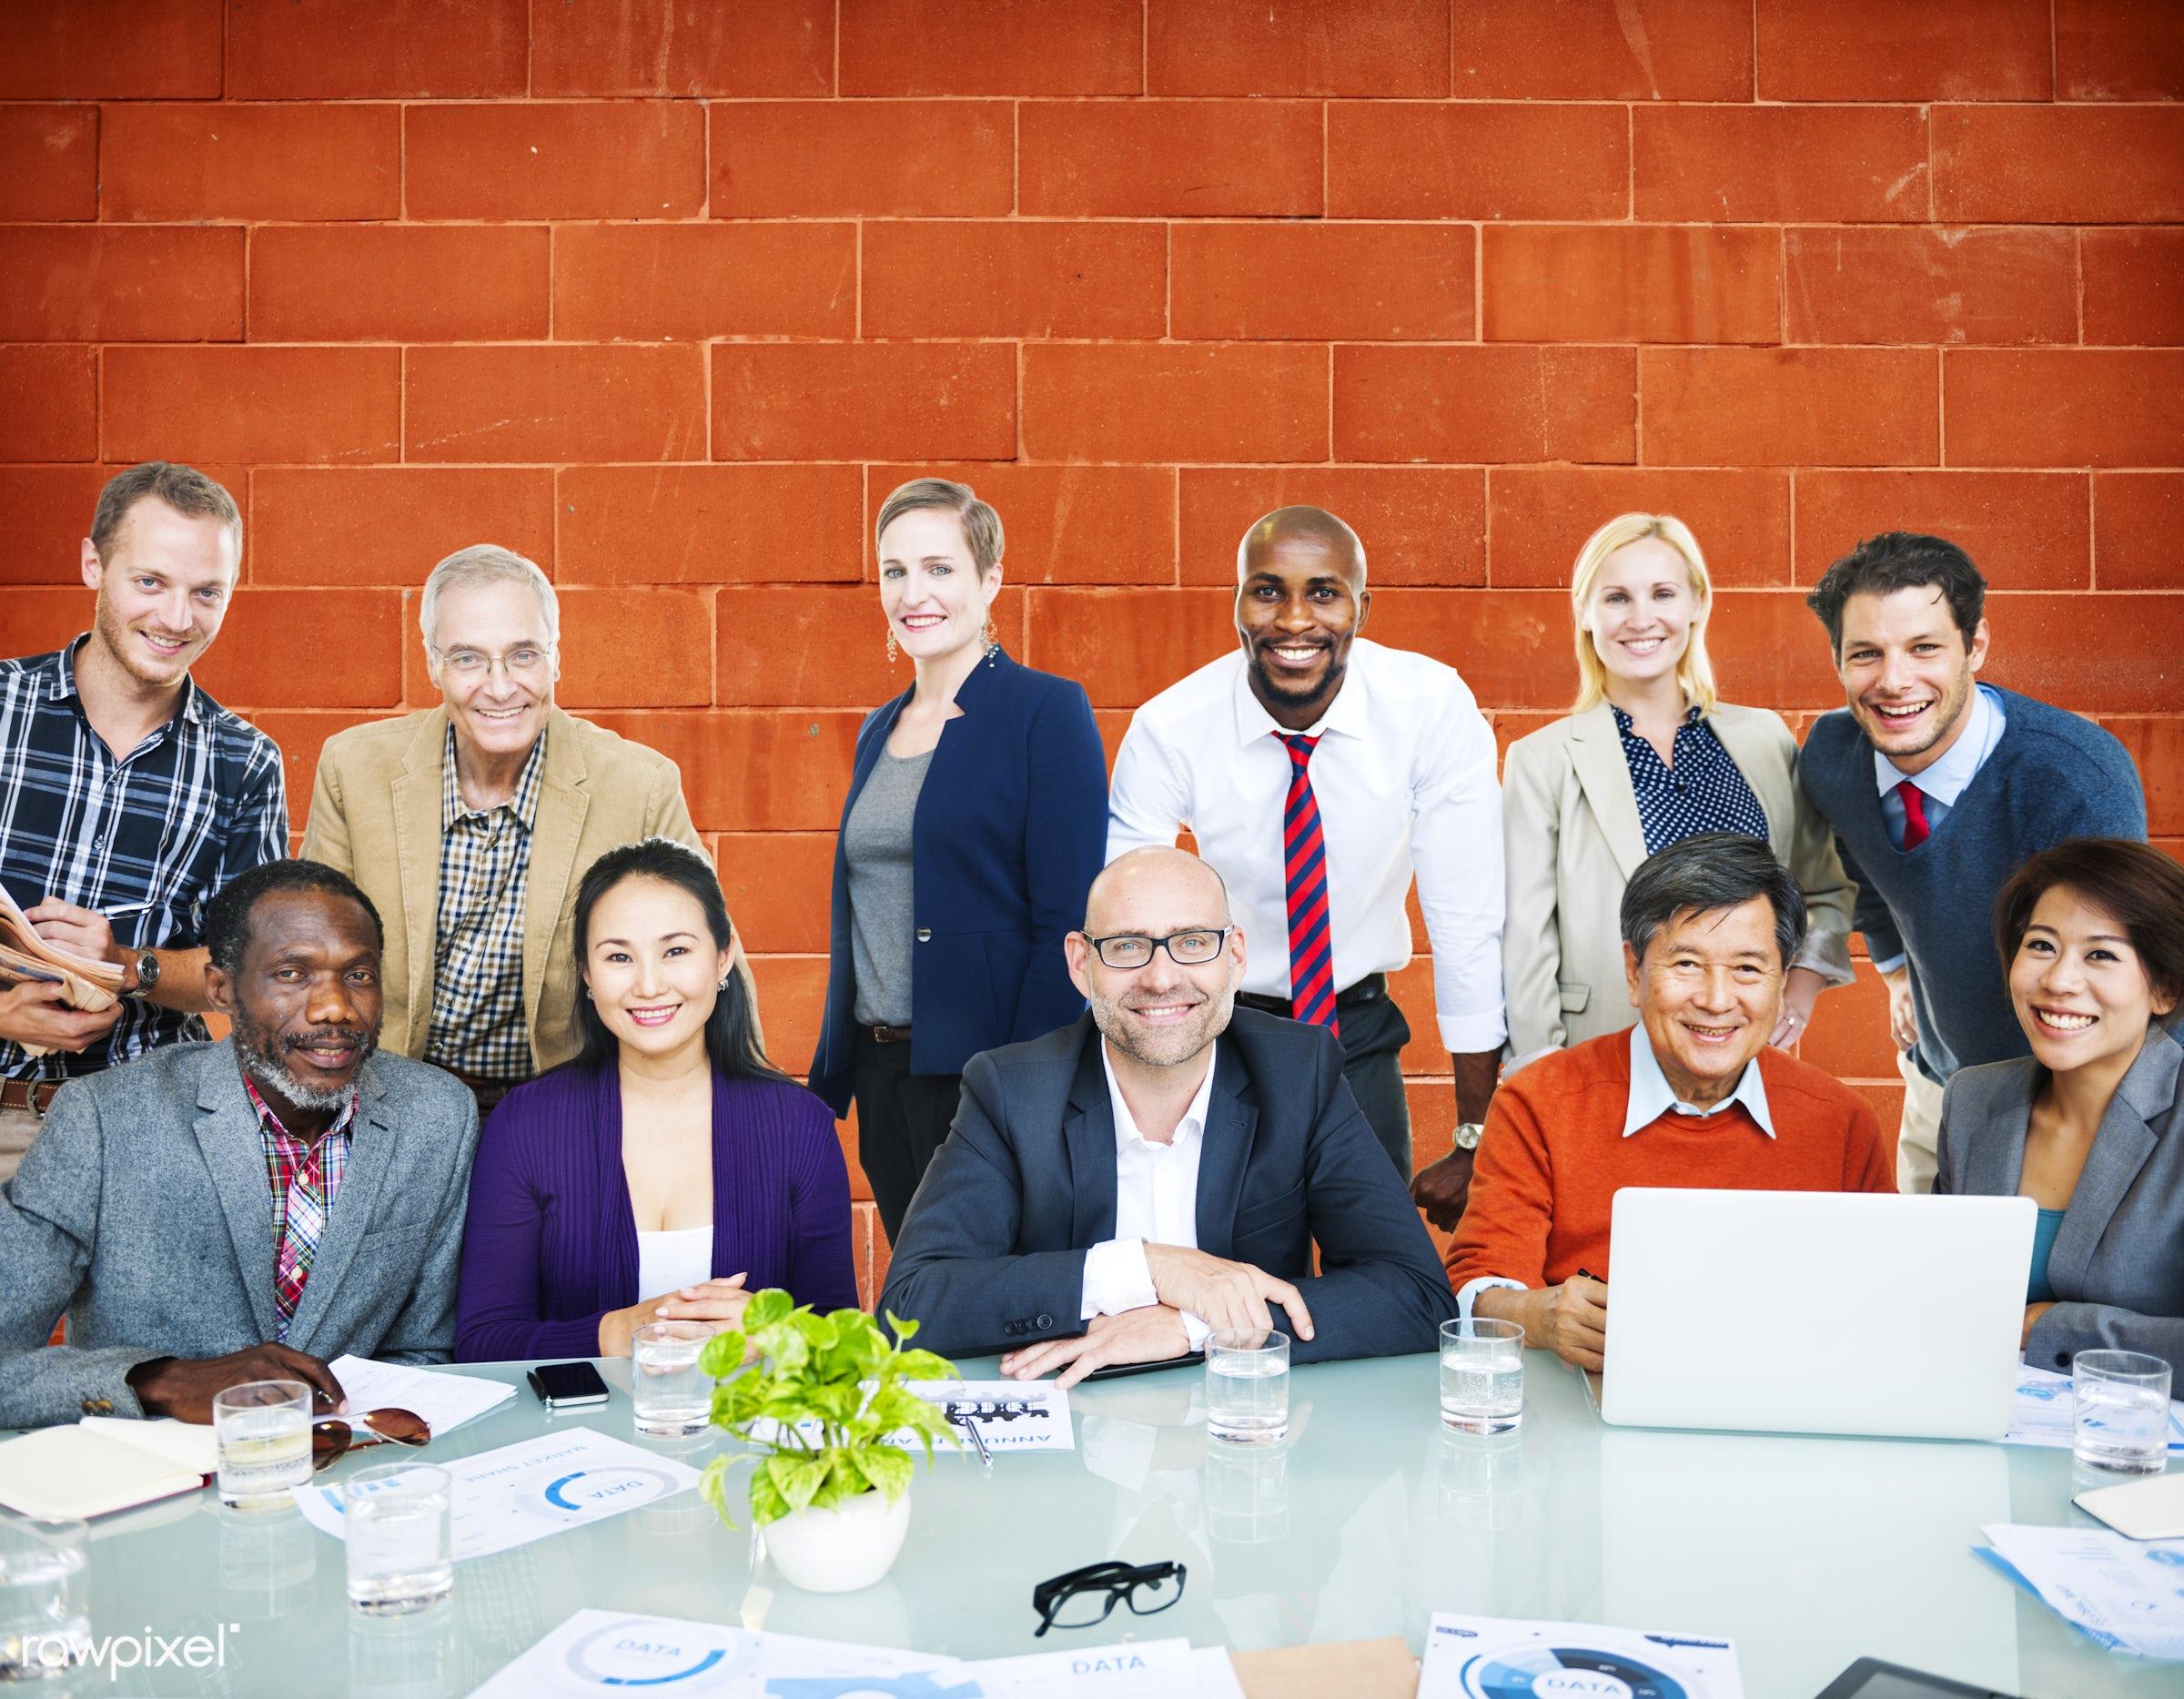 african descent, asian ethnicity, brick, brick wall, business, business people, businessmen, businesswomen, casual,...